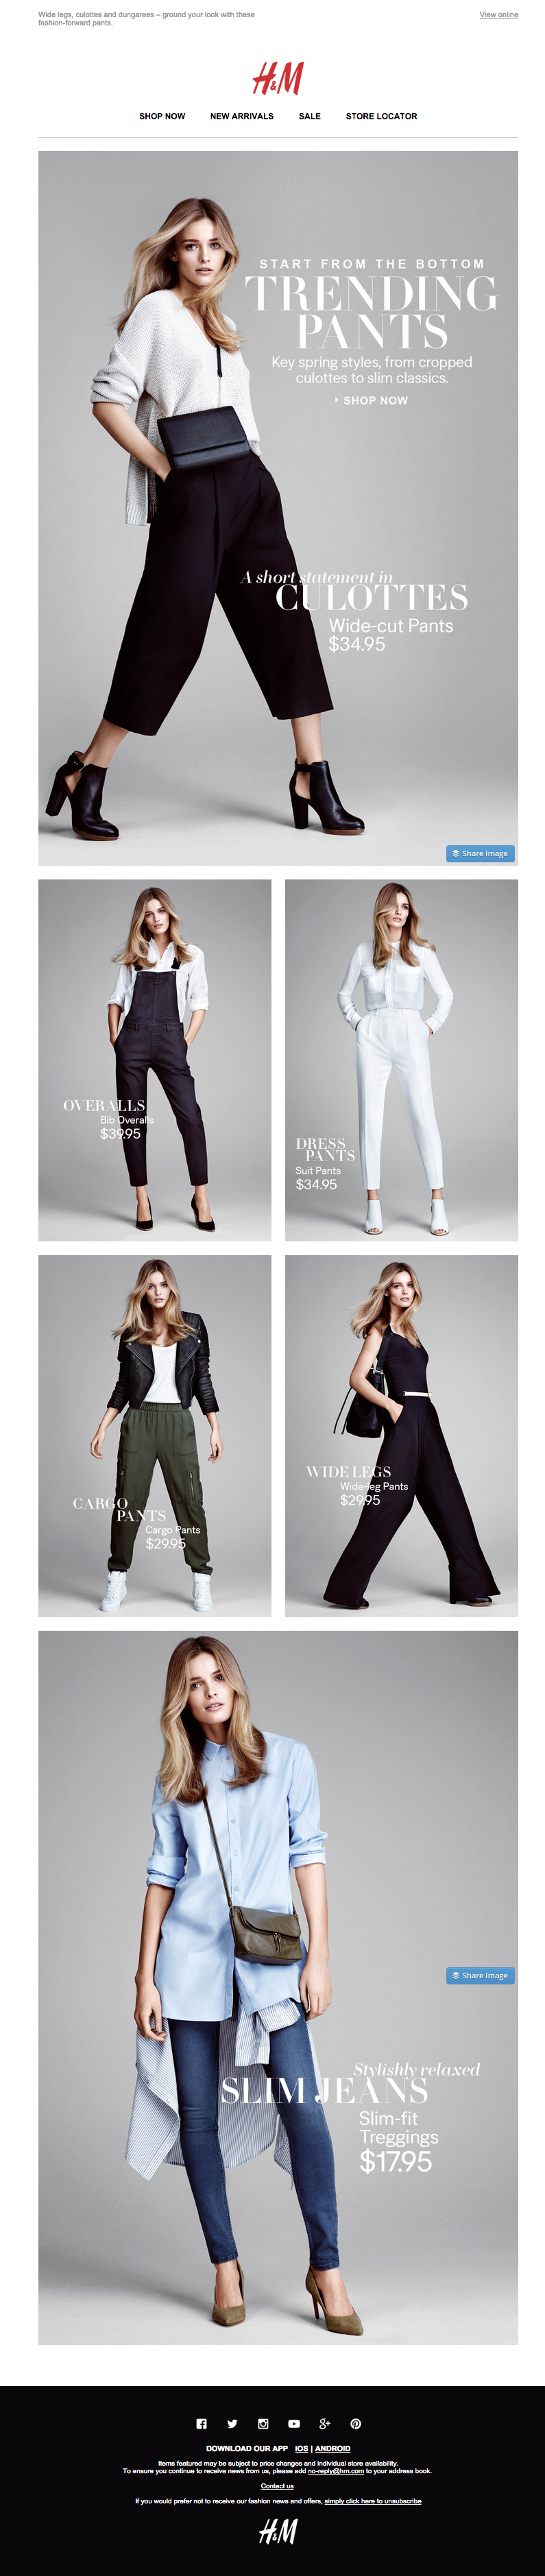 h m newsletter fashion email fashion design email email marketing email. Black Bedroom Furniture Sets. Home Design Ideas